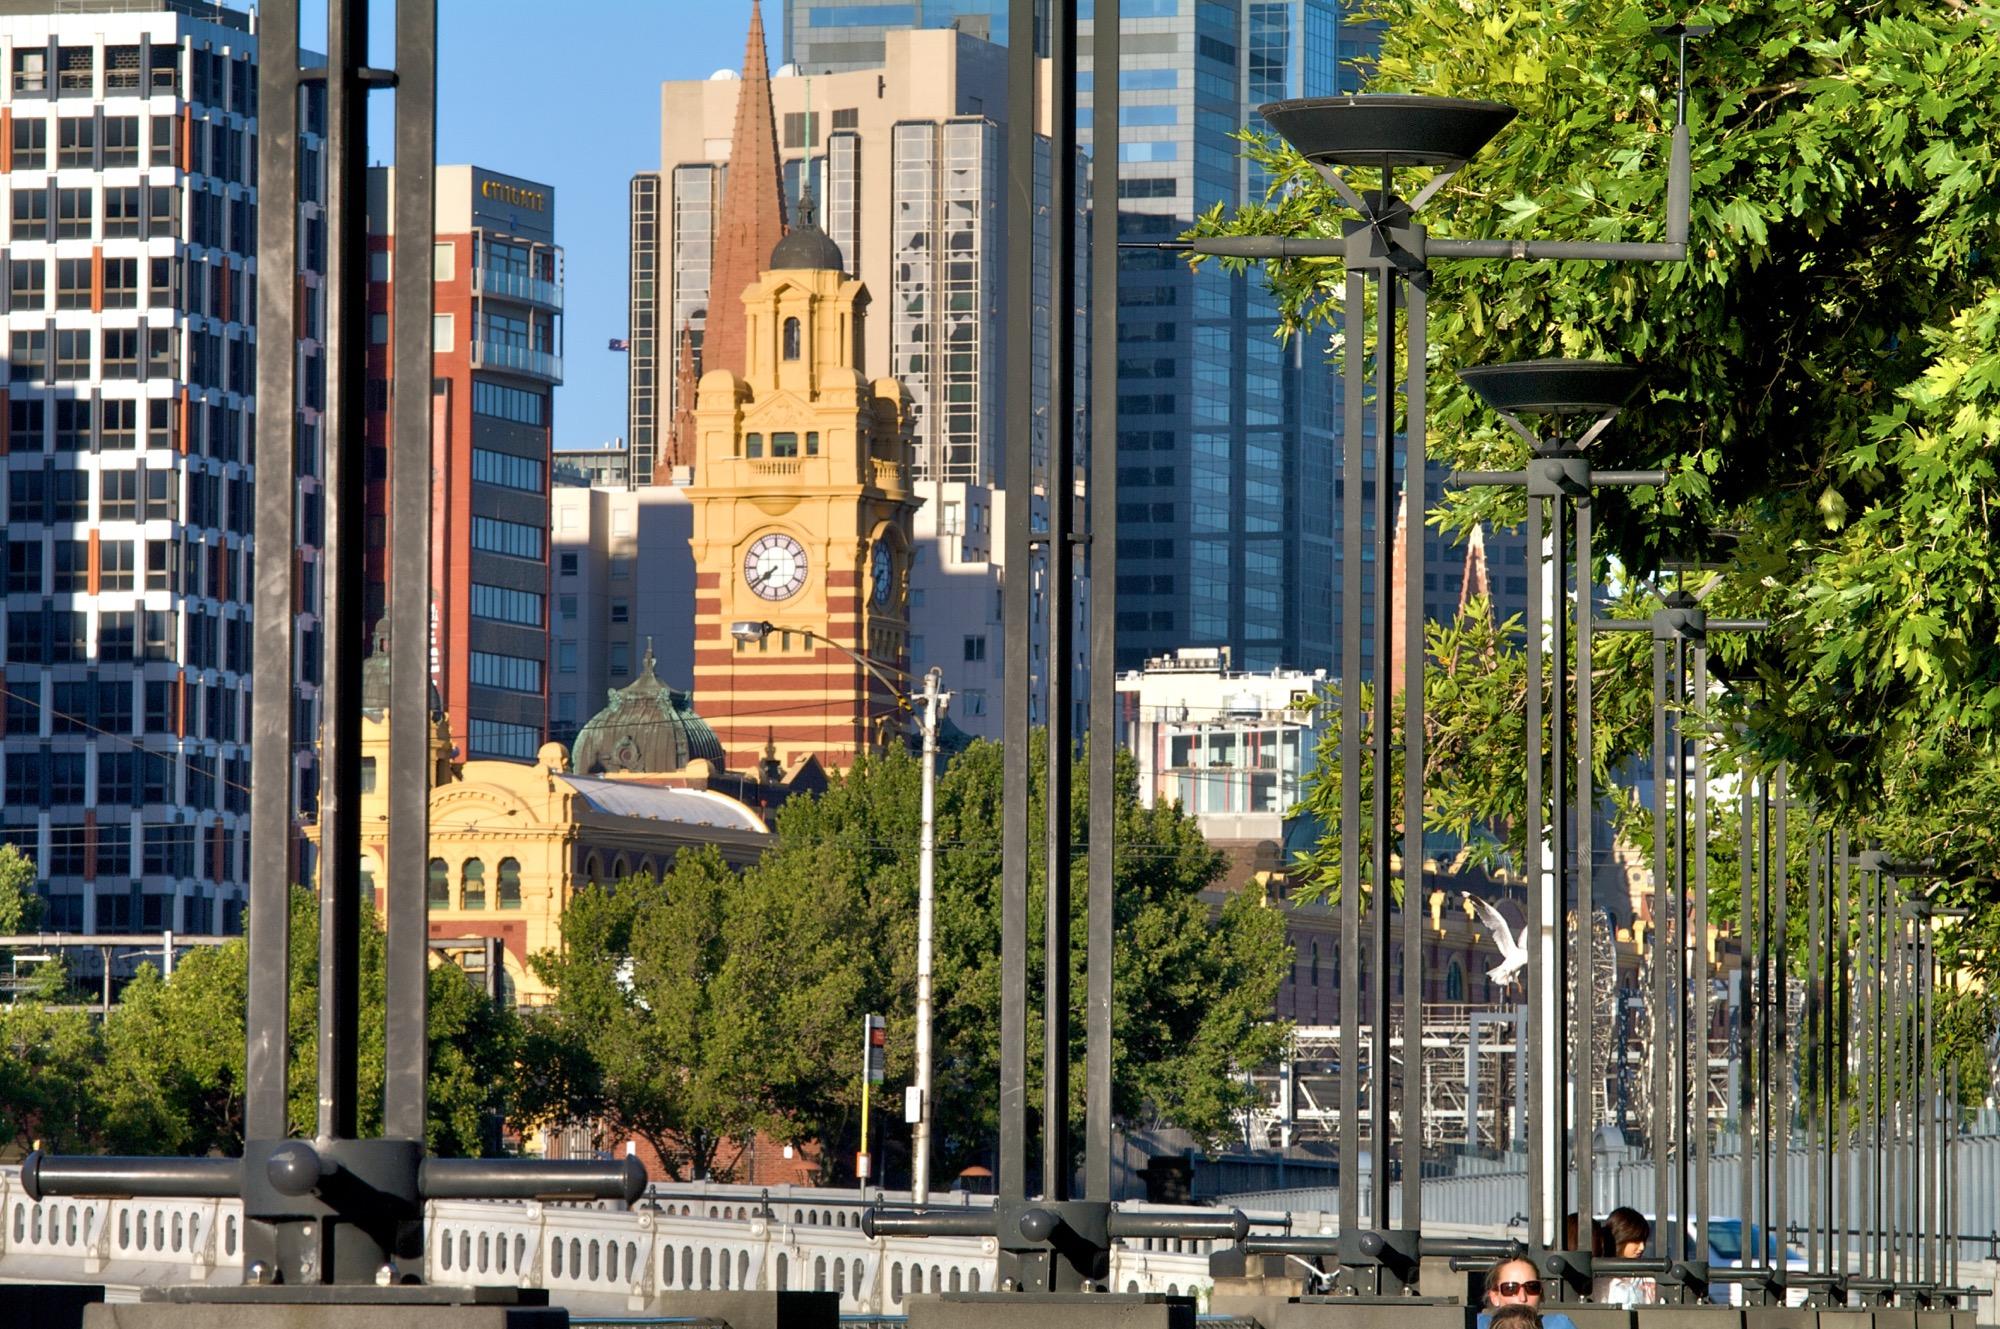 Melbourne stuff - 1 of 223 (95).jpg